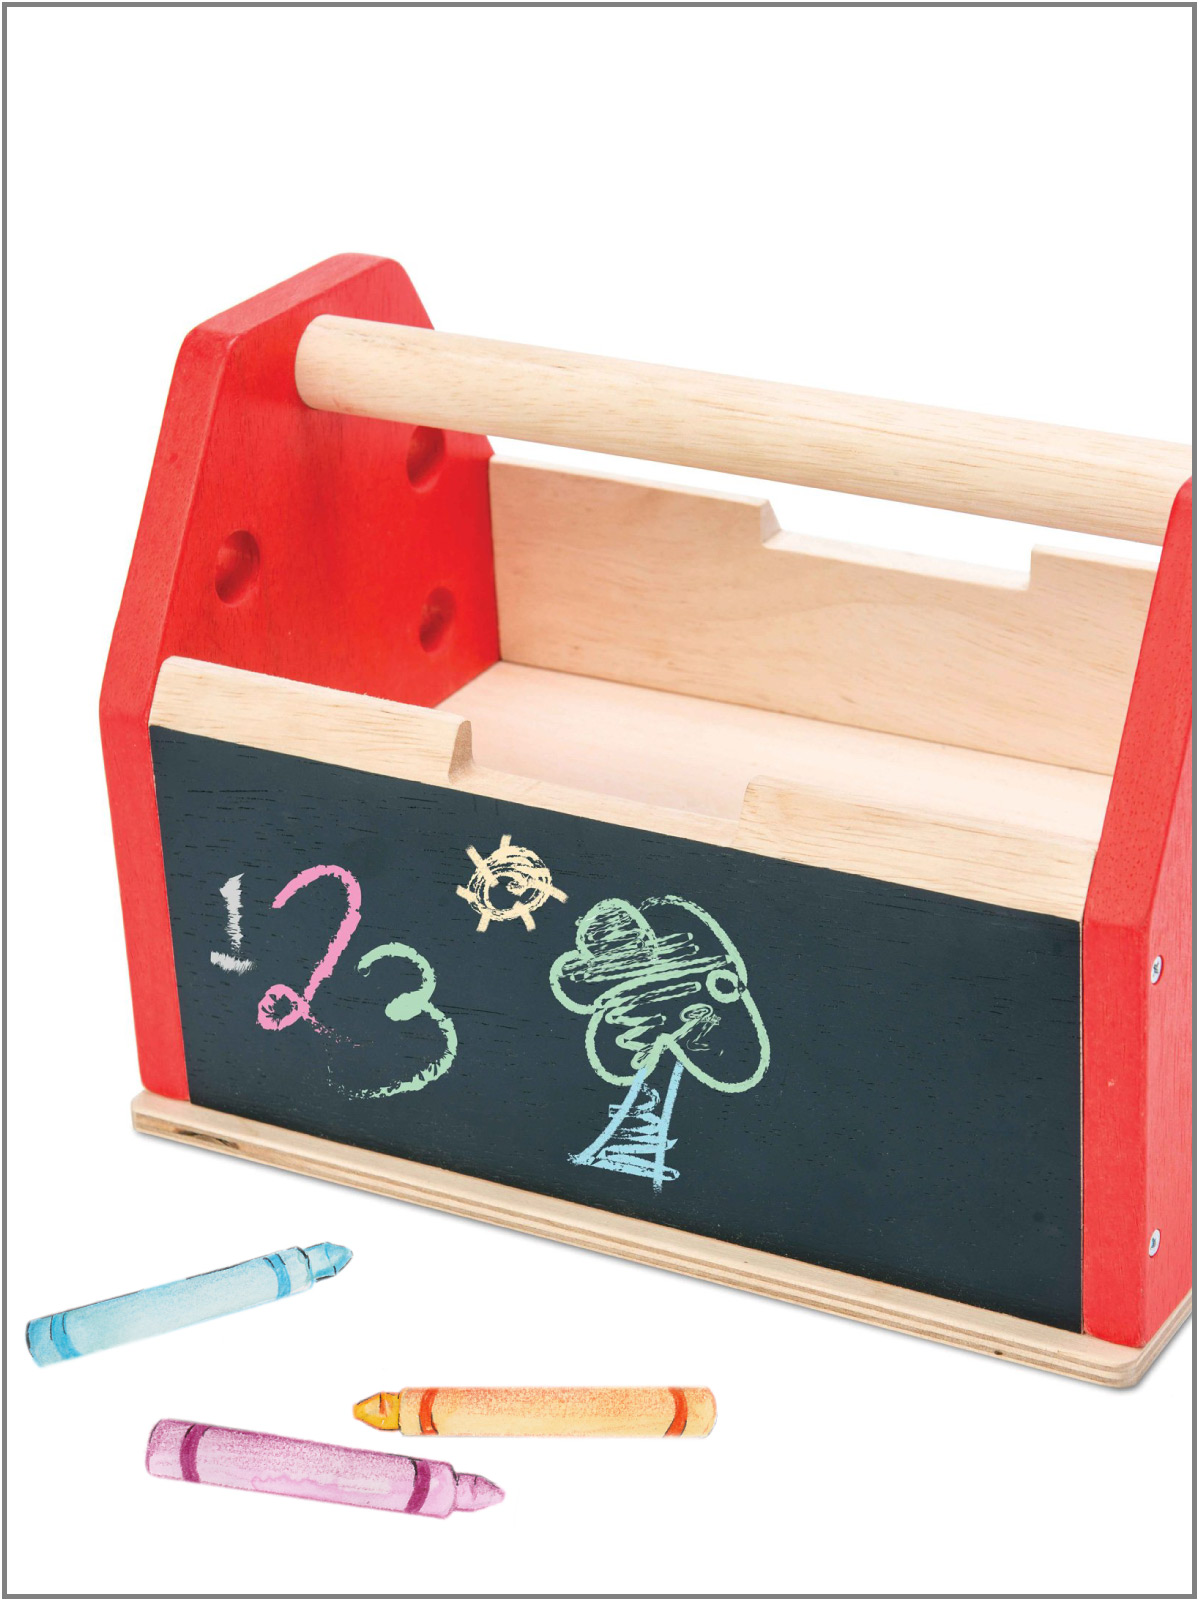 frederickandsophie-kids-toys-letoyvan-wooden-toolbox-tools